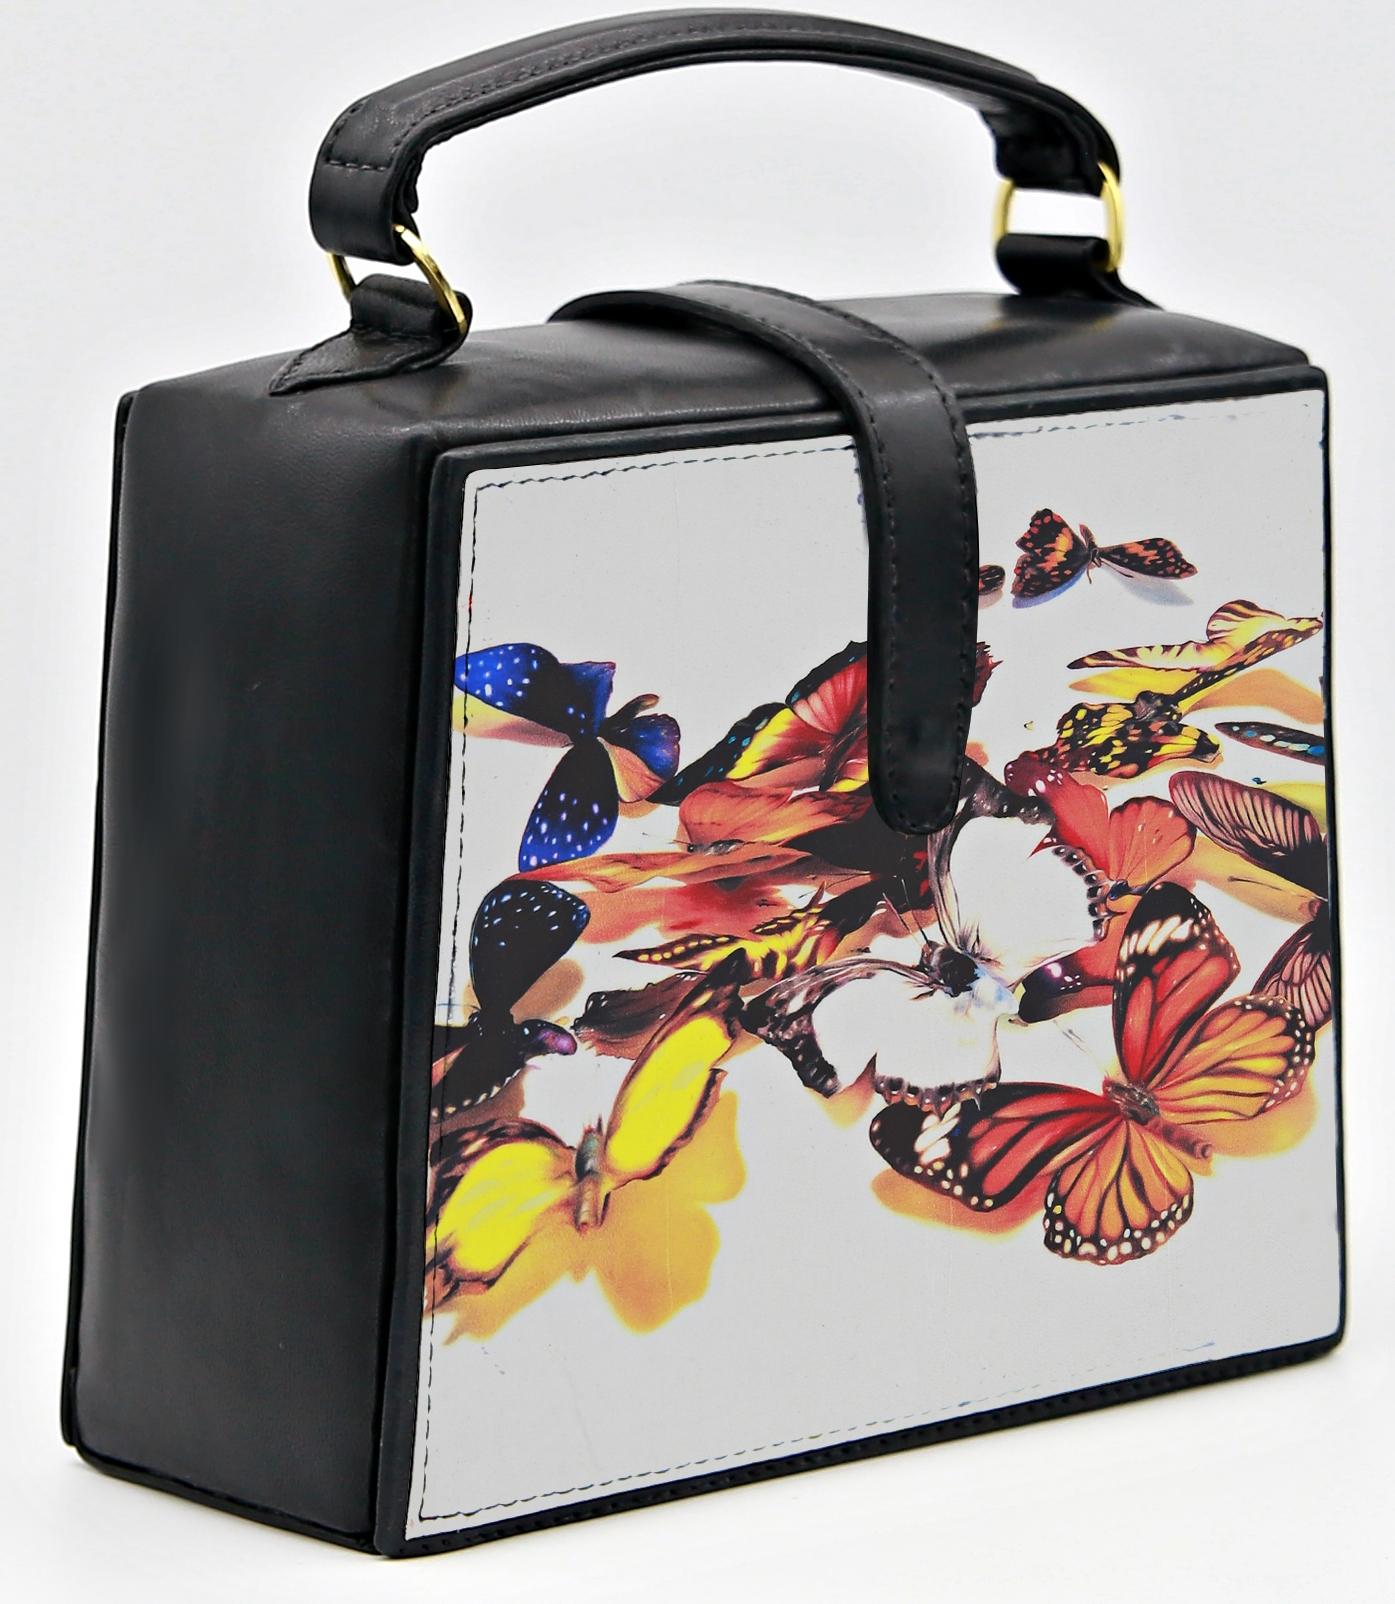 Butterfly Trapeze Bag Nir-Look-16-crop.jpg